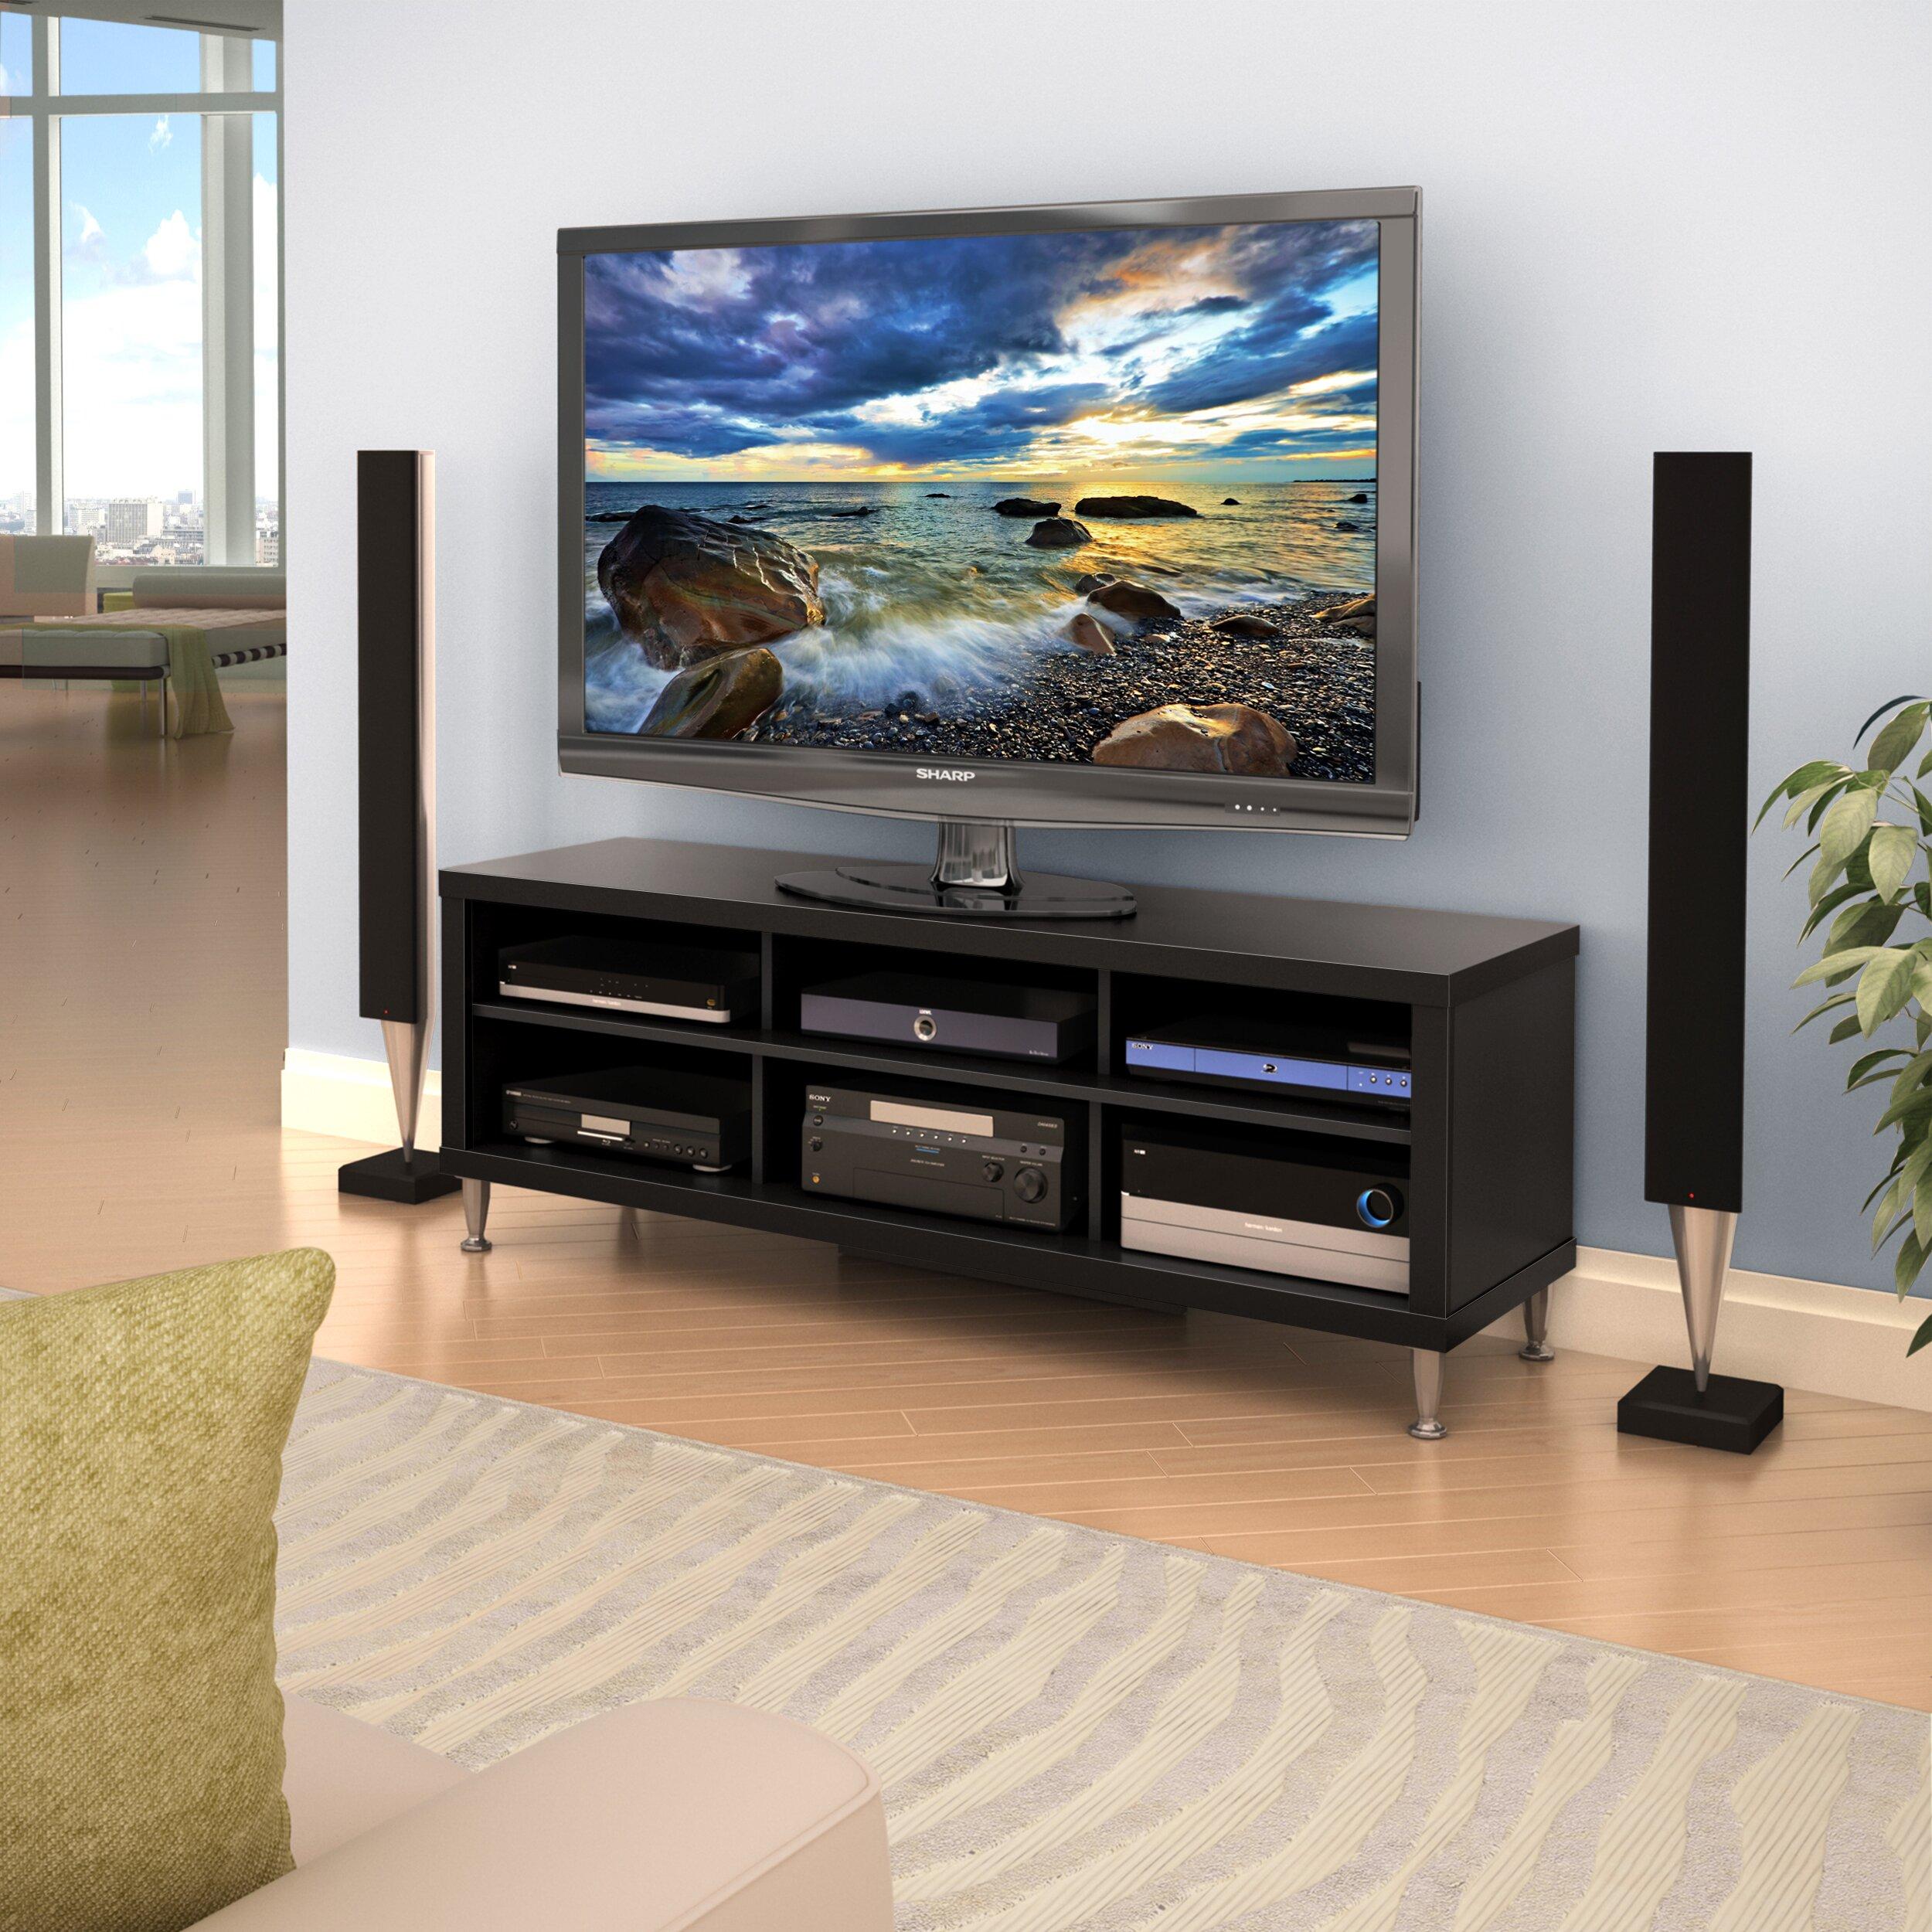 Prepac espresso series 9 wall mounted headboard system with 2 - Prepac Series 9 Black Designer Tv Stand